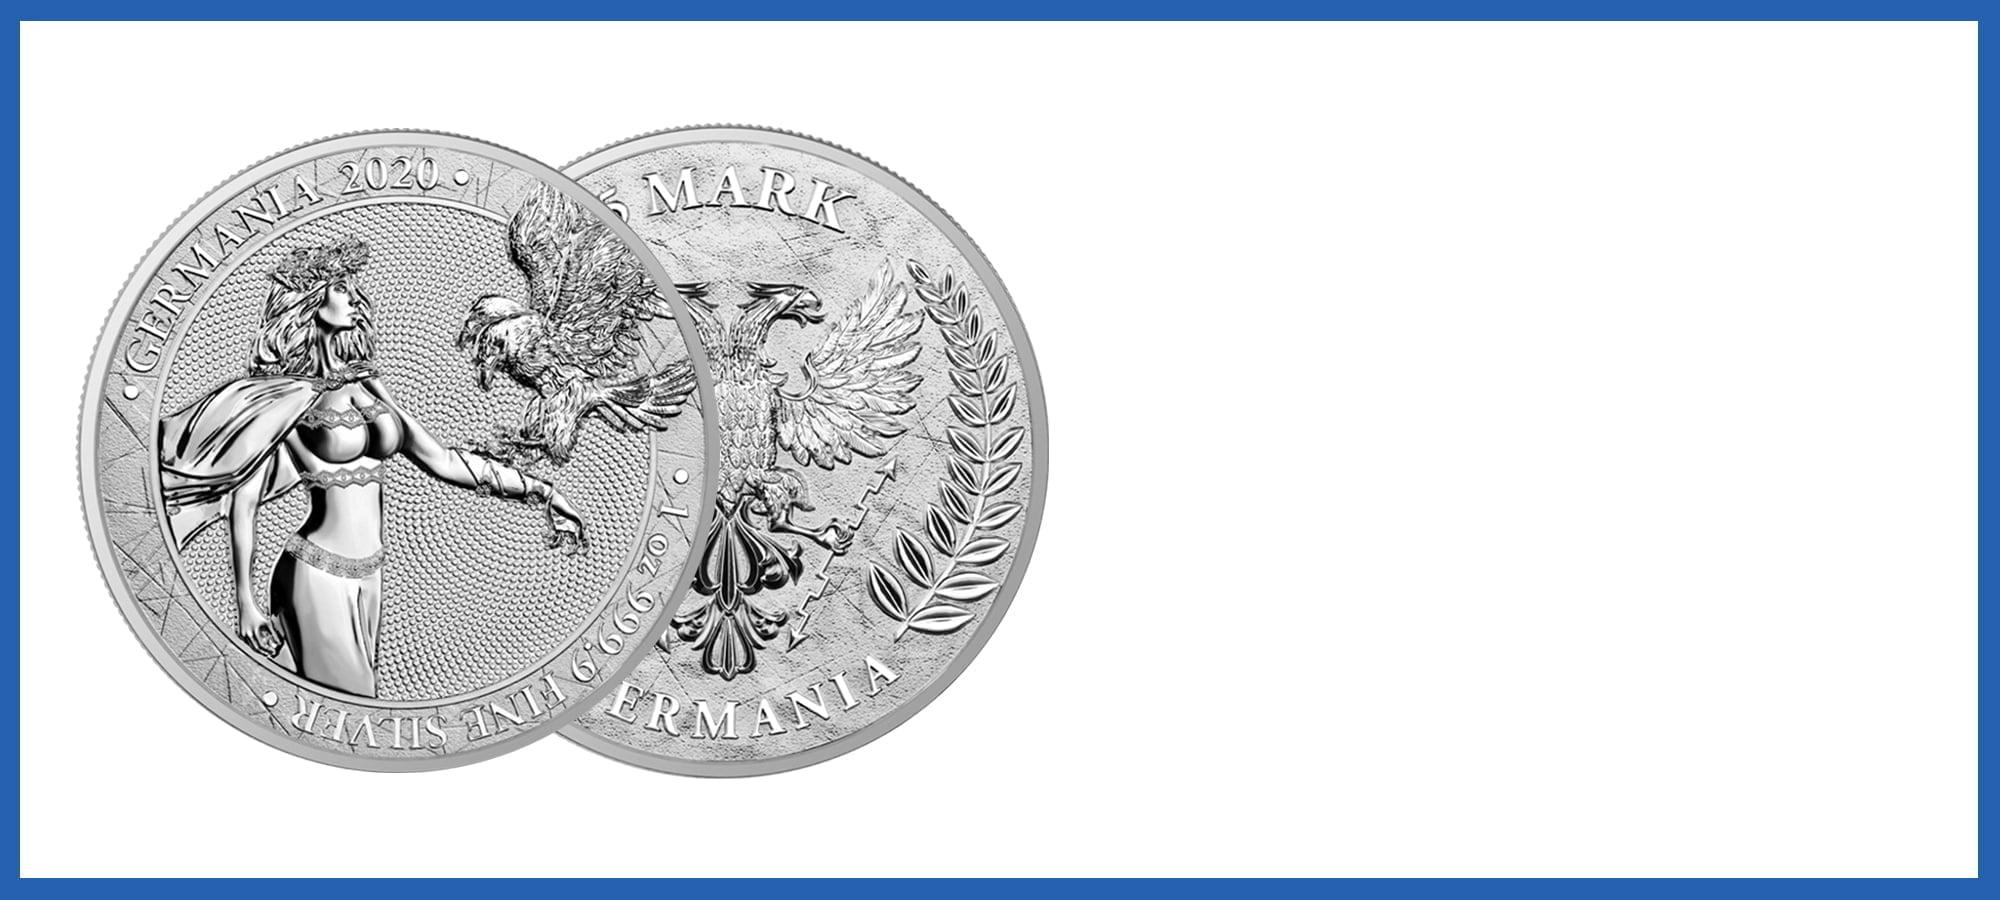 2020 1oz Lady Germania 5 Mark Silver Coin